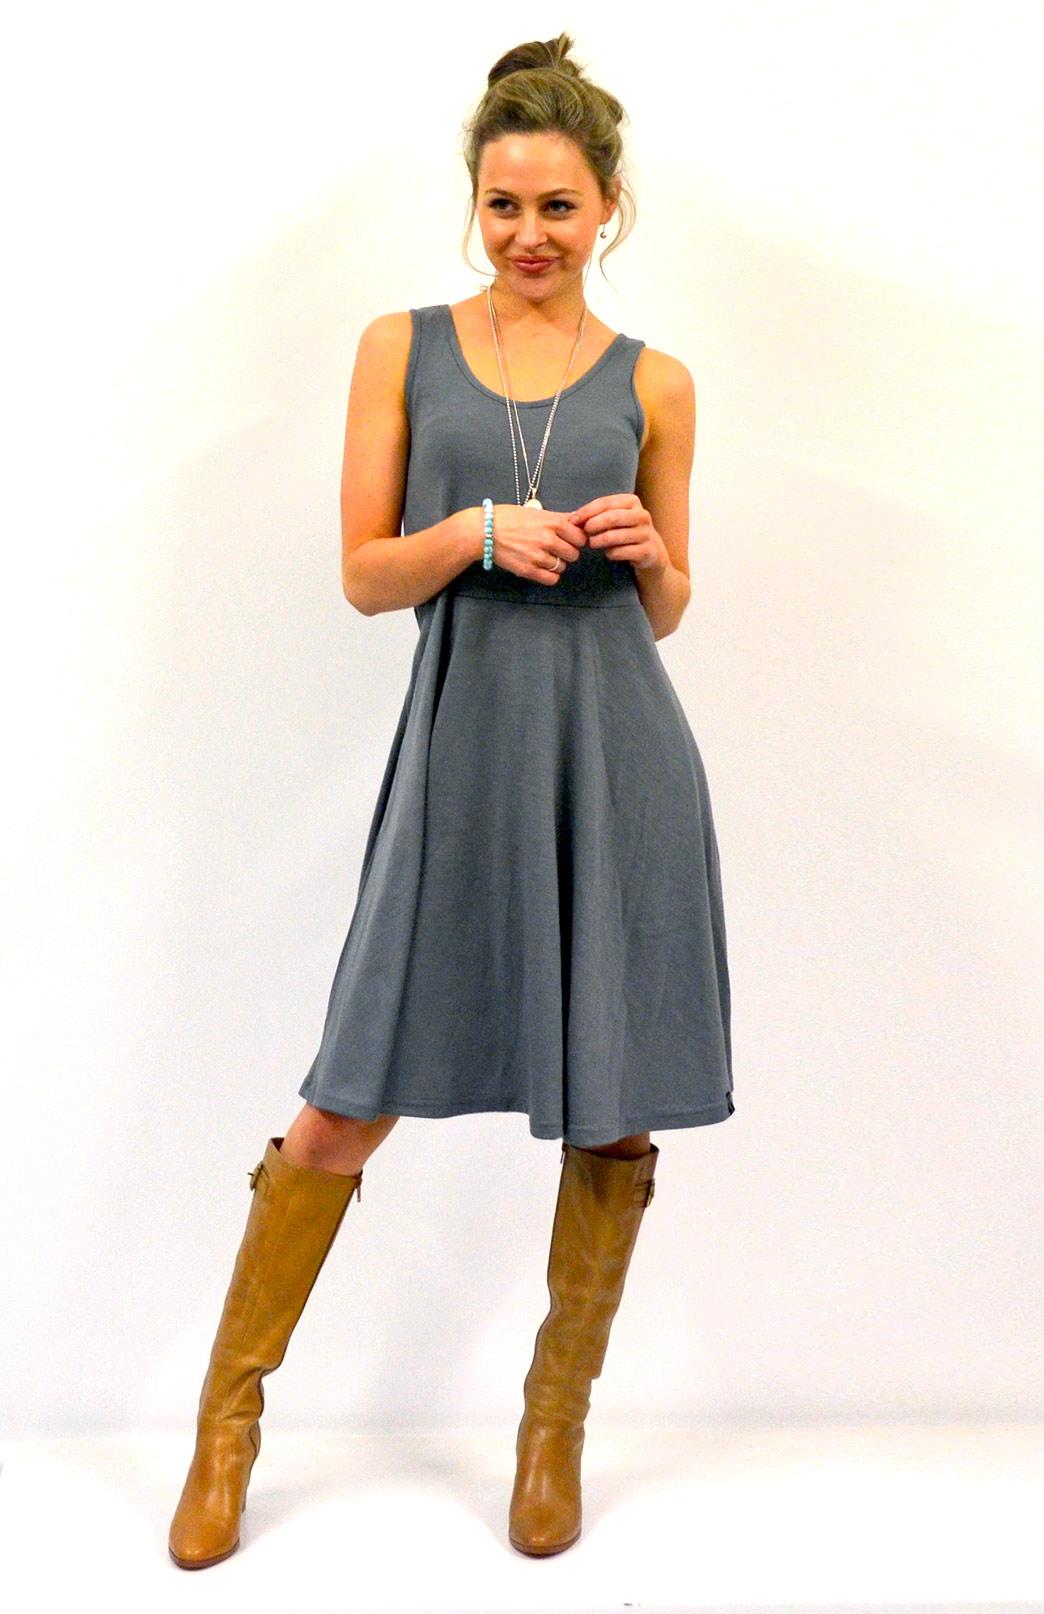 Jackie Dress - Sleeveless - Women's Smoke Grey Sleeveless Jackie Dress with Waist Seam and Flared Skirt - Smitten Merino Tasmania Australia